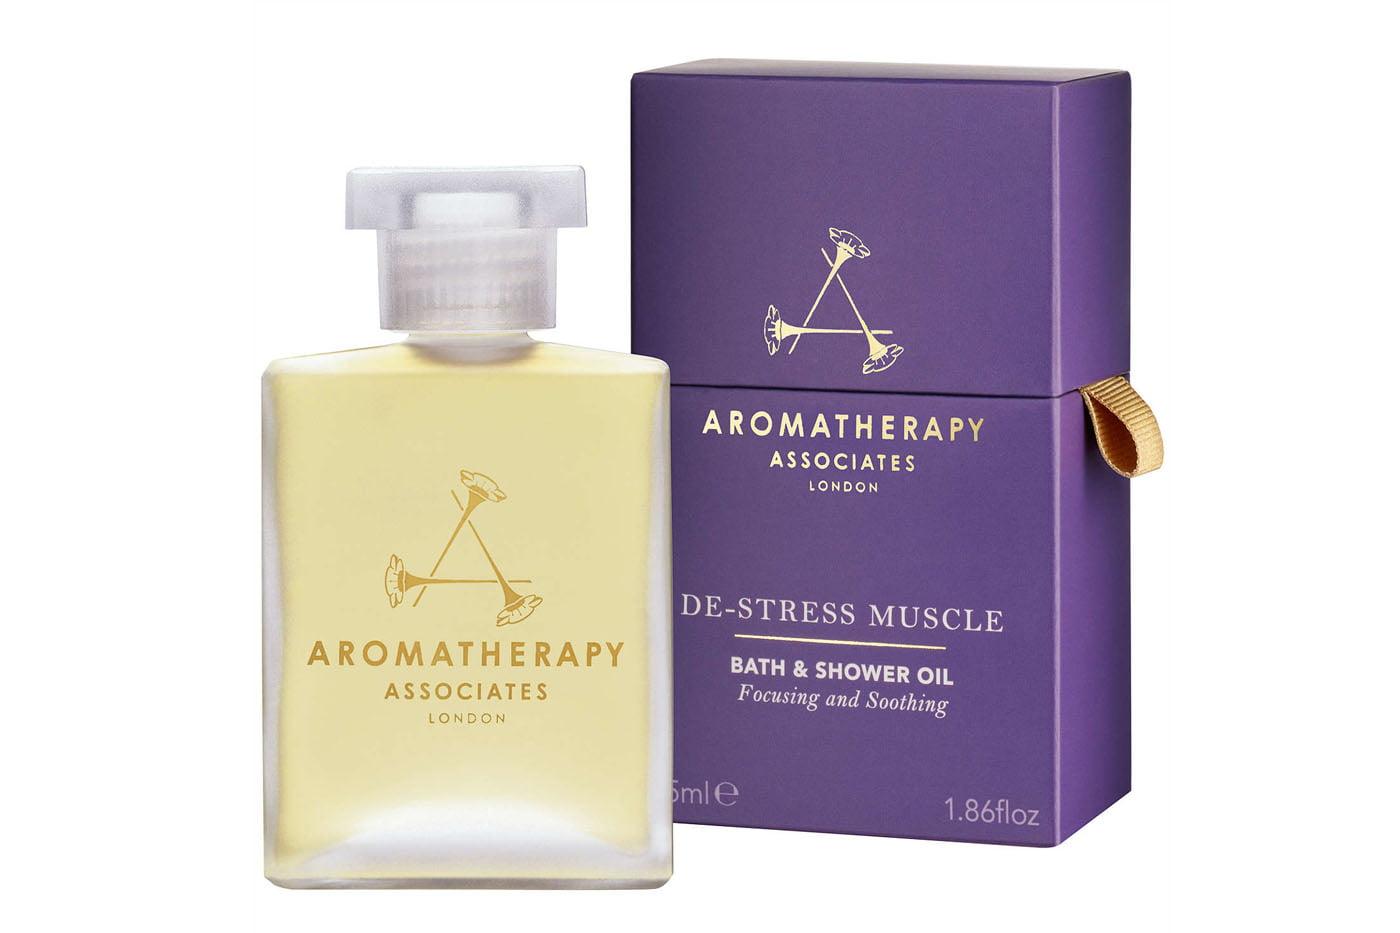 aromatherapy associates destress muscle gel review